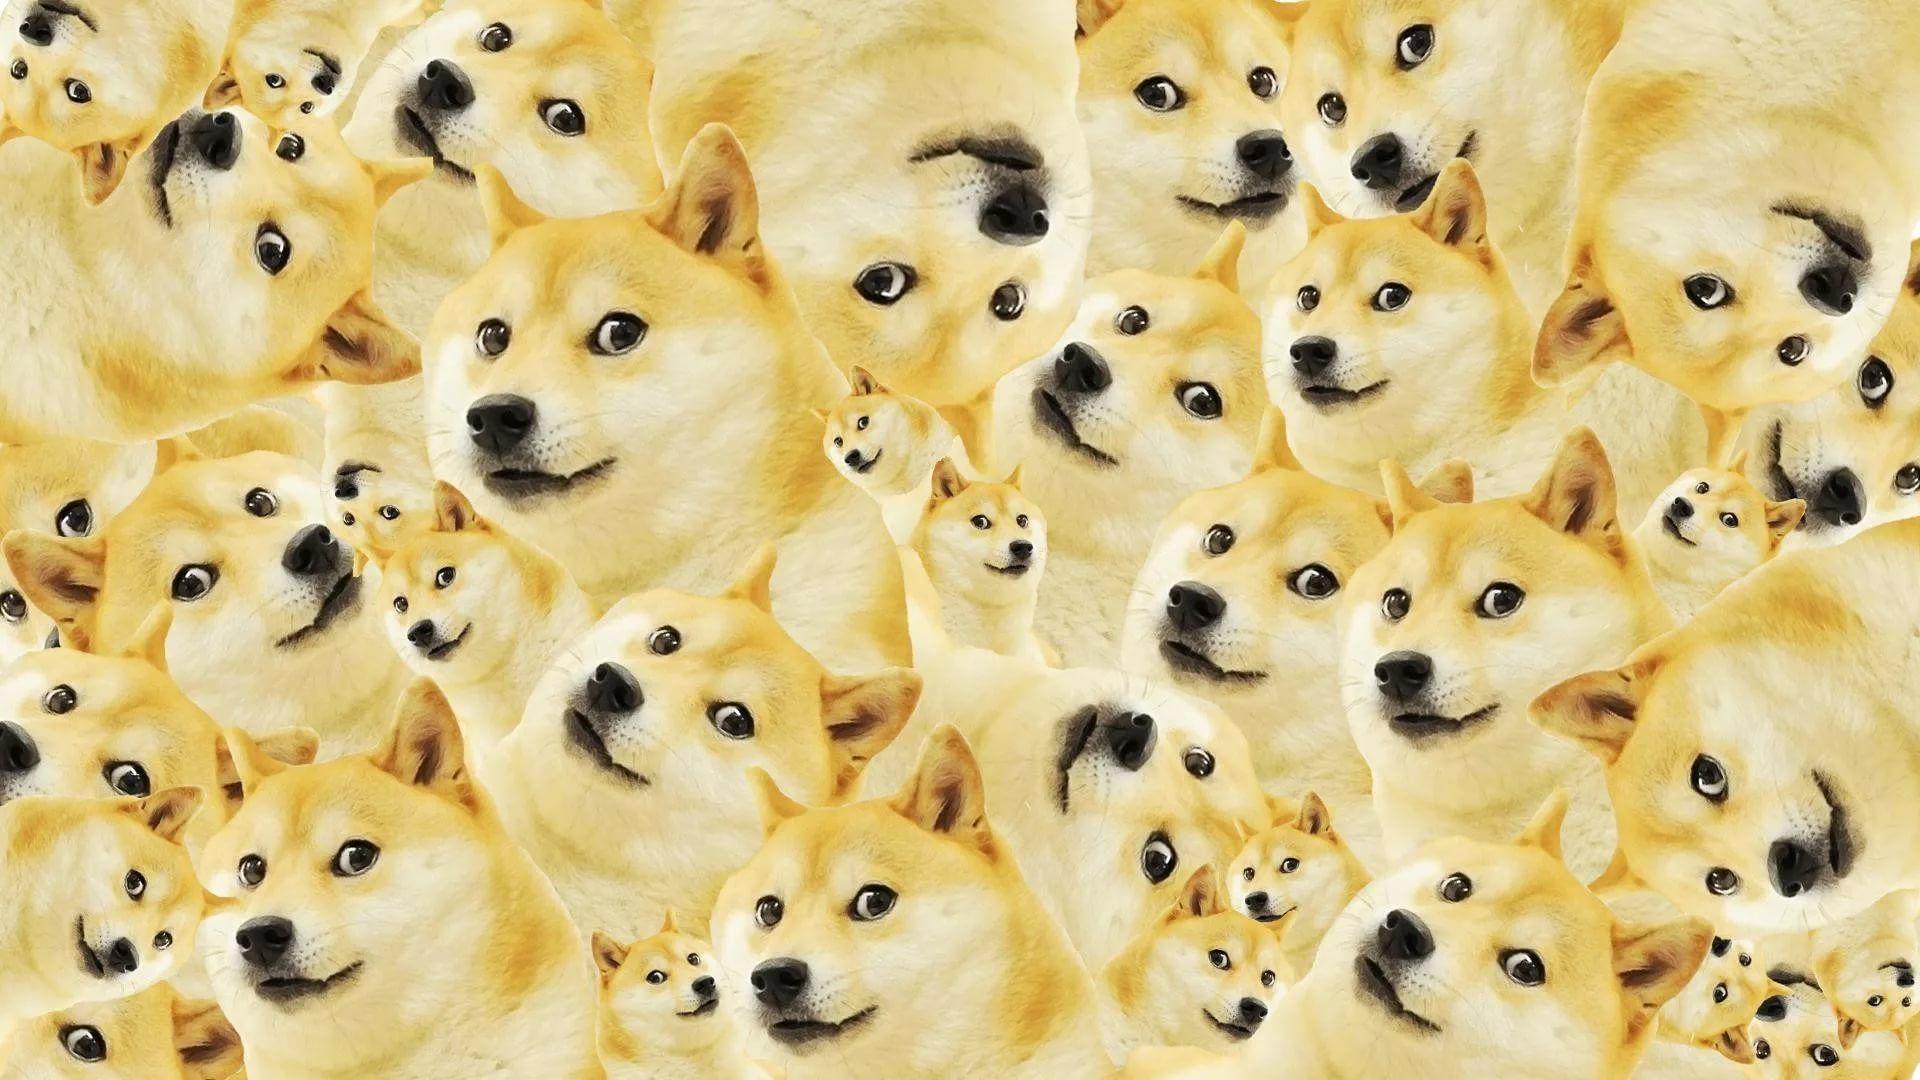 Doge Meme Wallpaper 1920x1080 Wallpapers Hd Quality